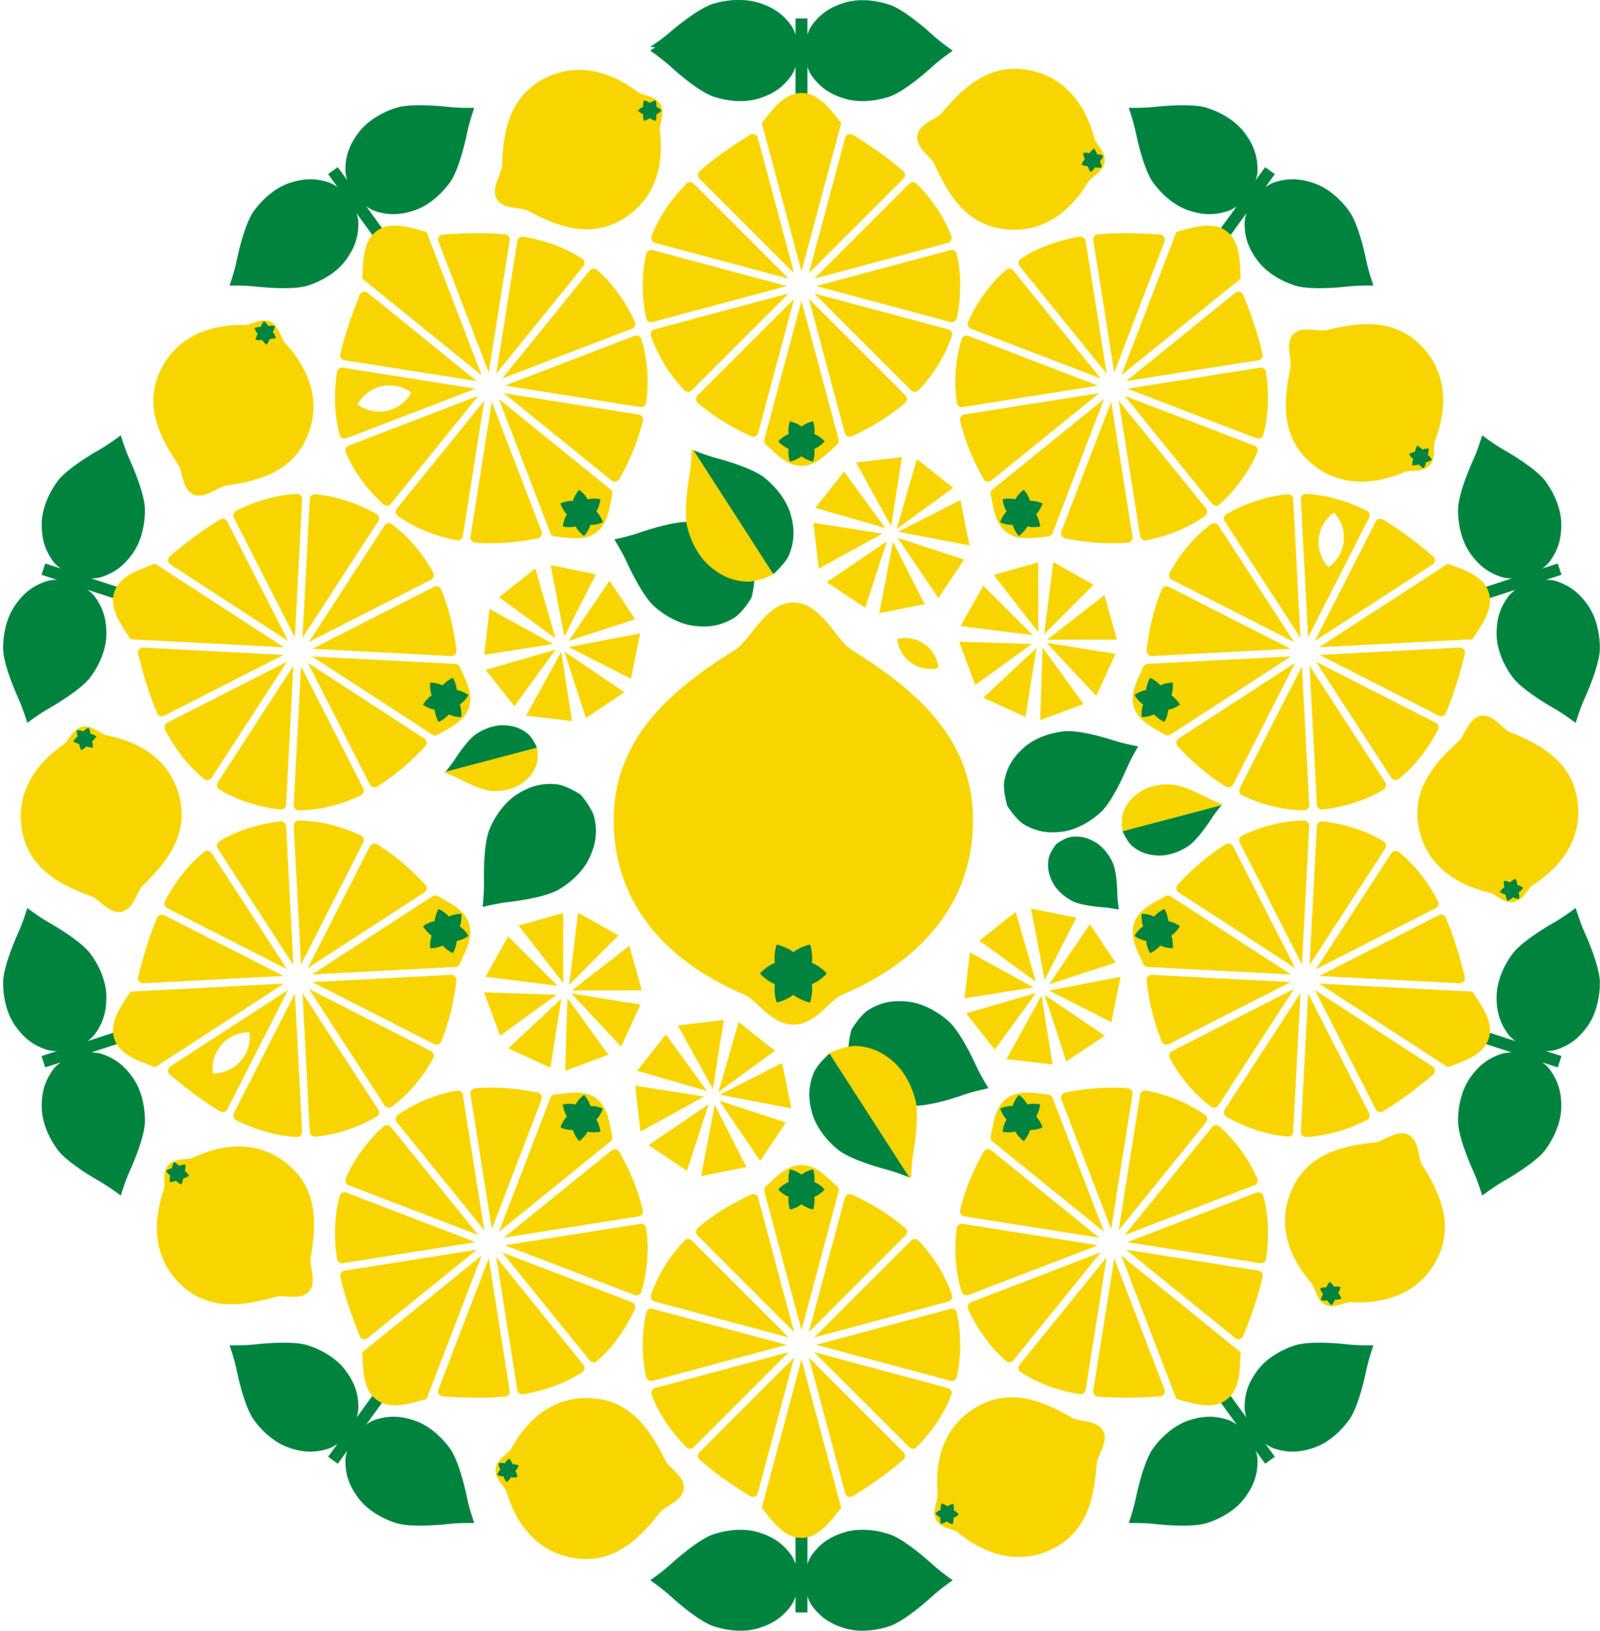 Citron annangul